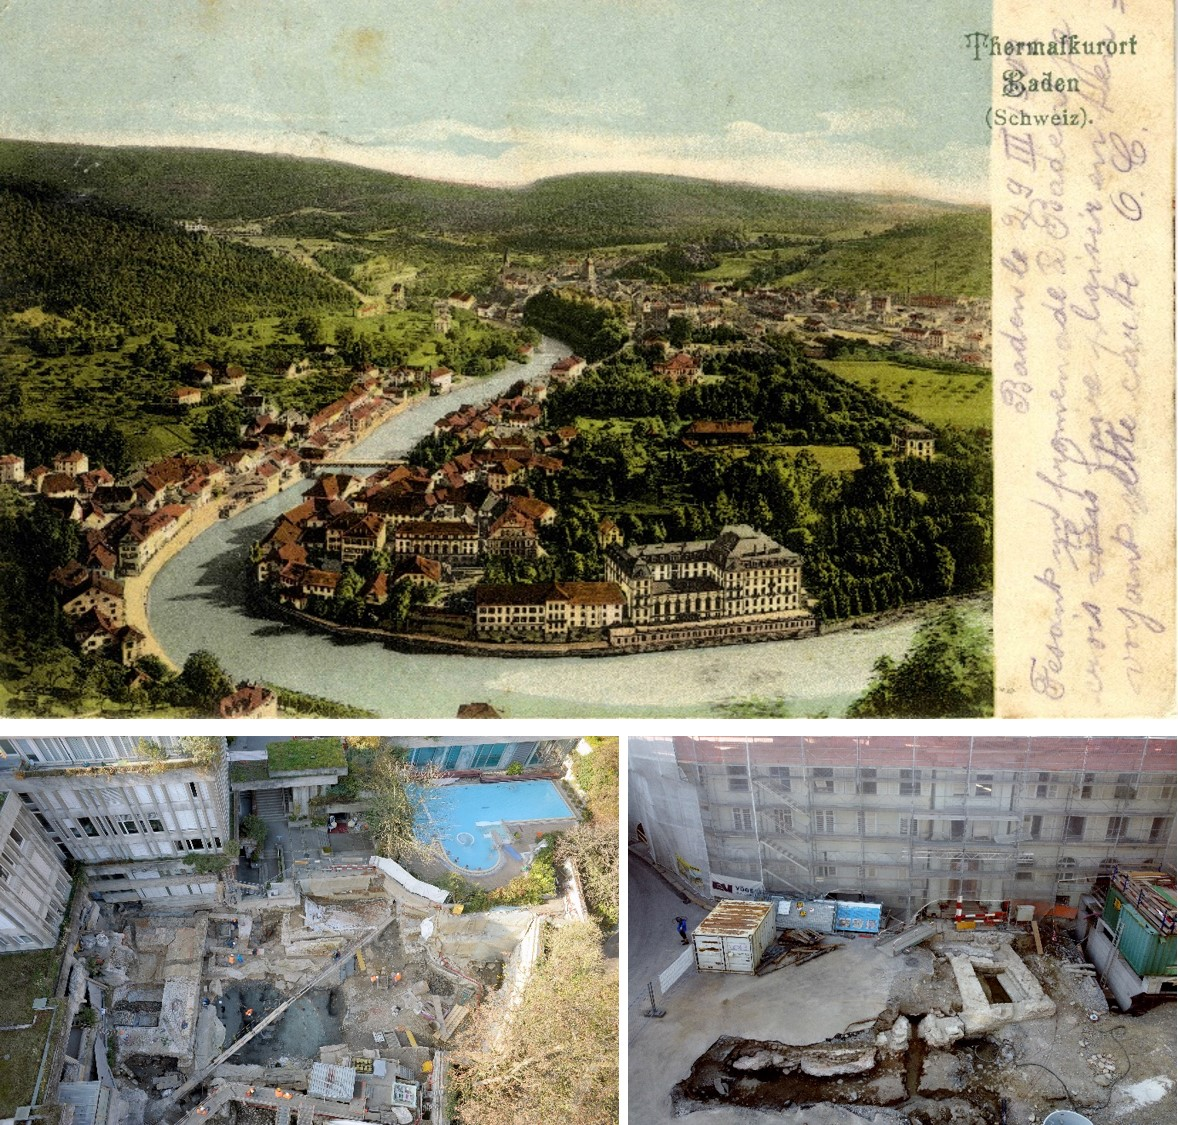 Baden, postcard. Private coll. Andrea Schaer. Some images of Baden archaeological excavations. Photos: Kantonsarchaeologie Aargau/Samuel Muehleisen